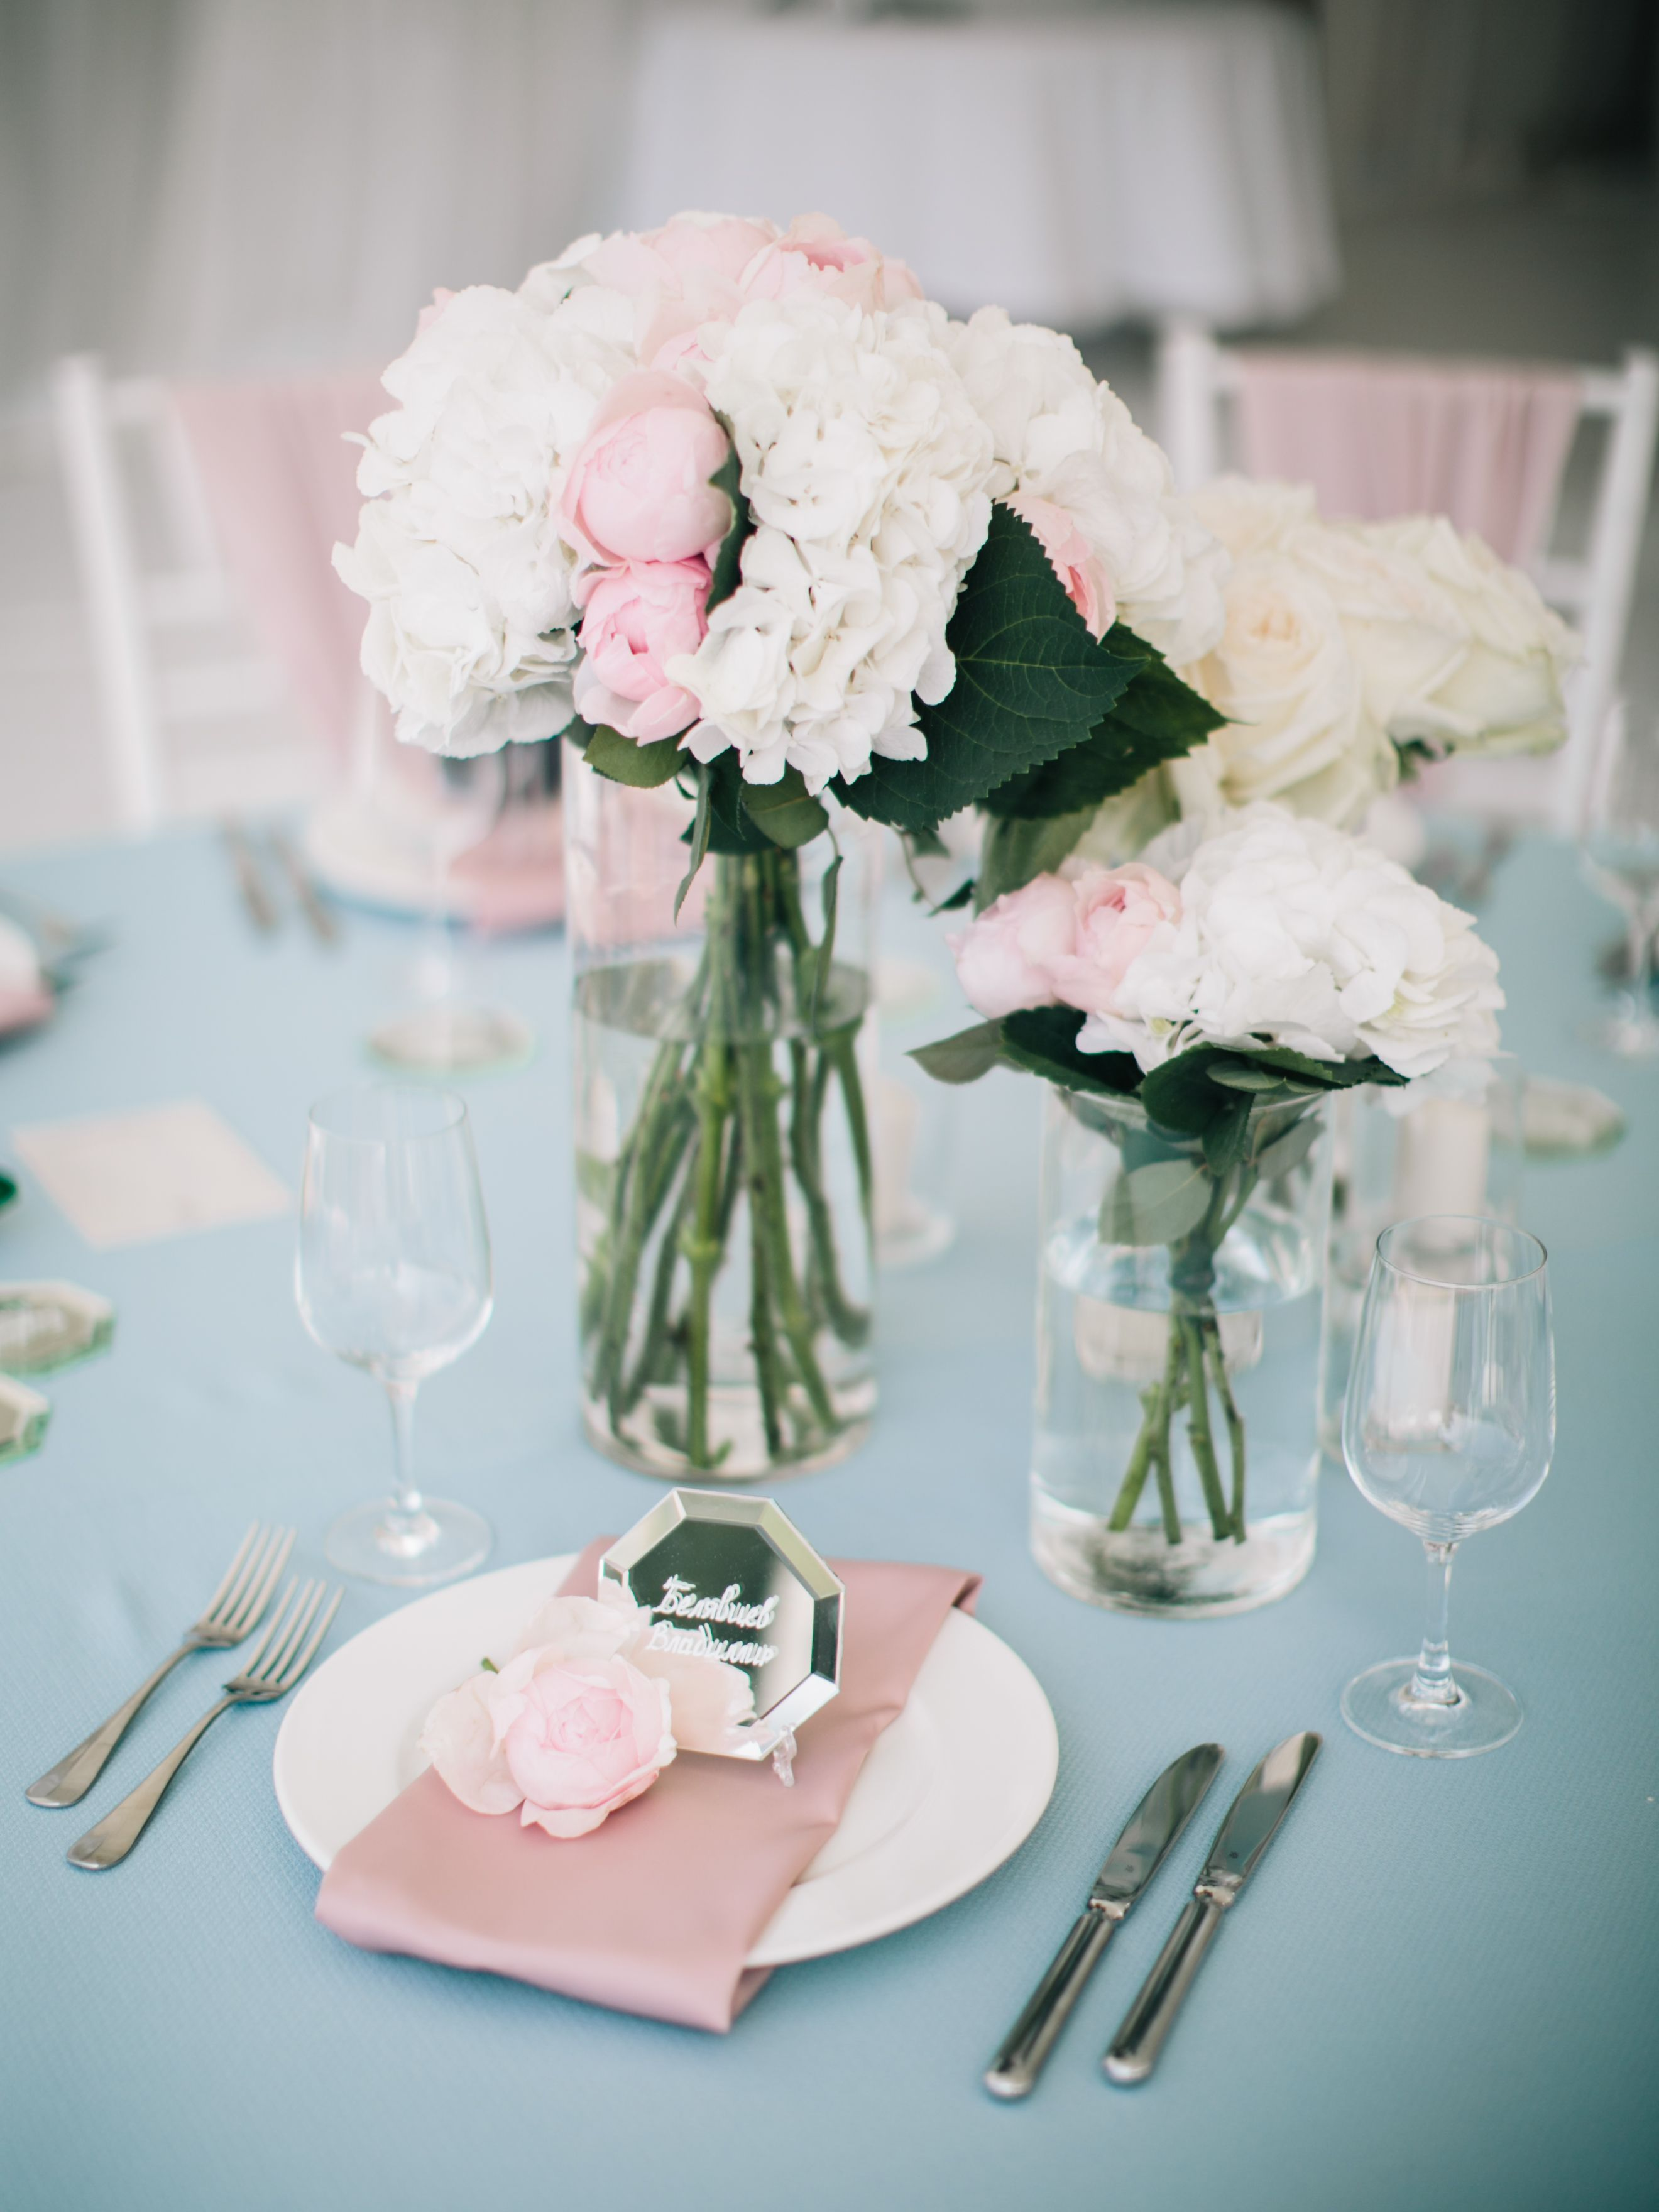 Wedding table setting, wedding guest card flowers, mirror